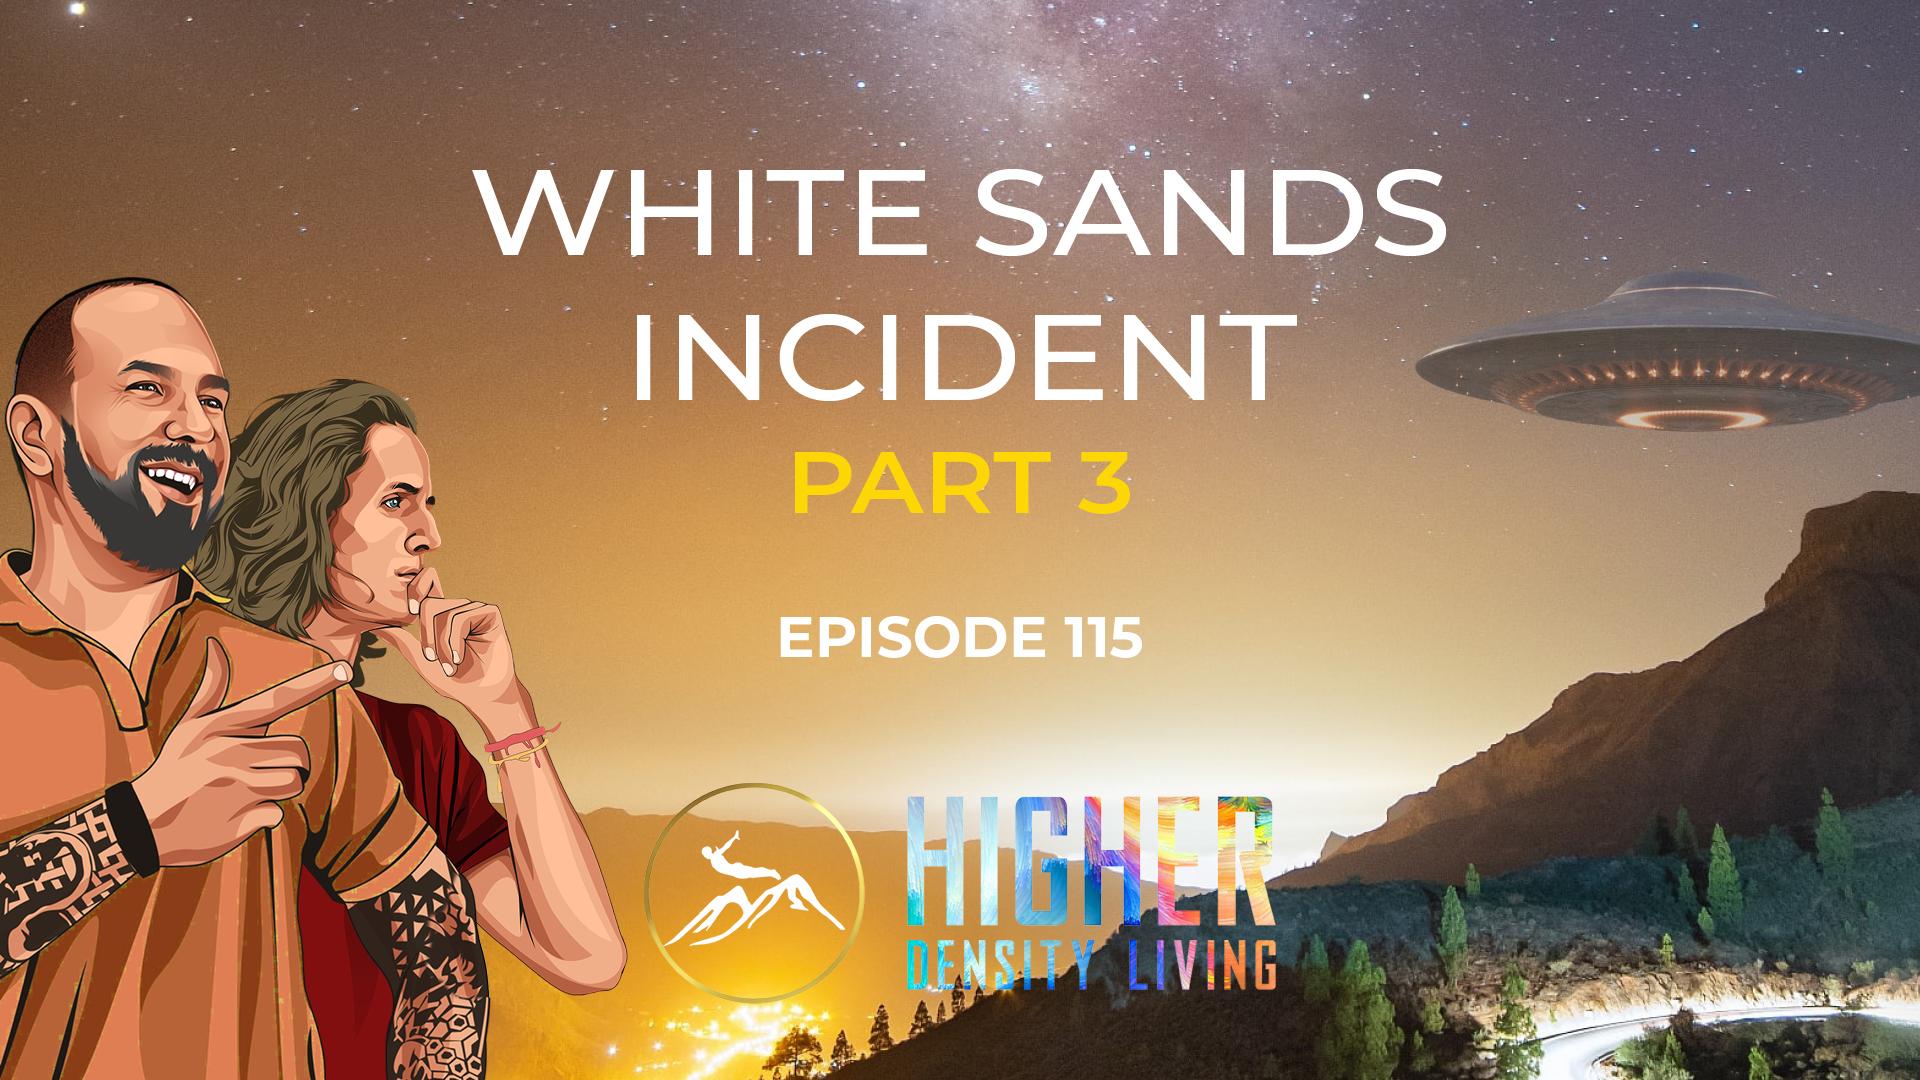 White Sands Incident - Part 3